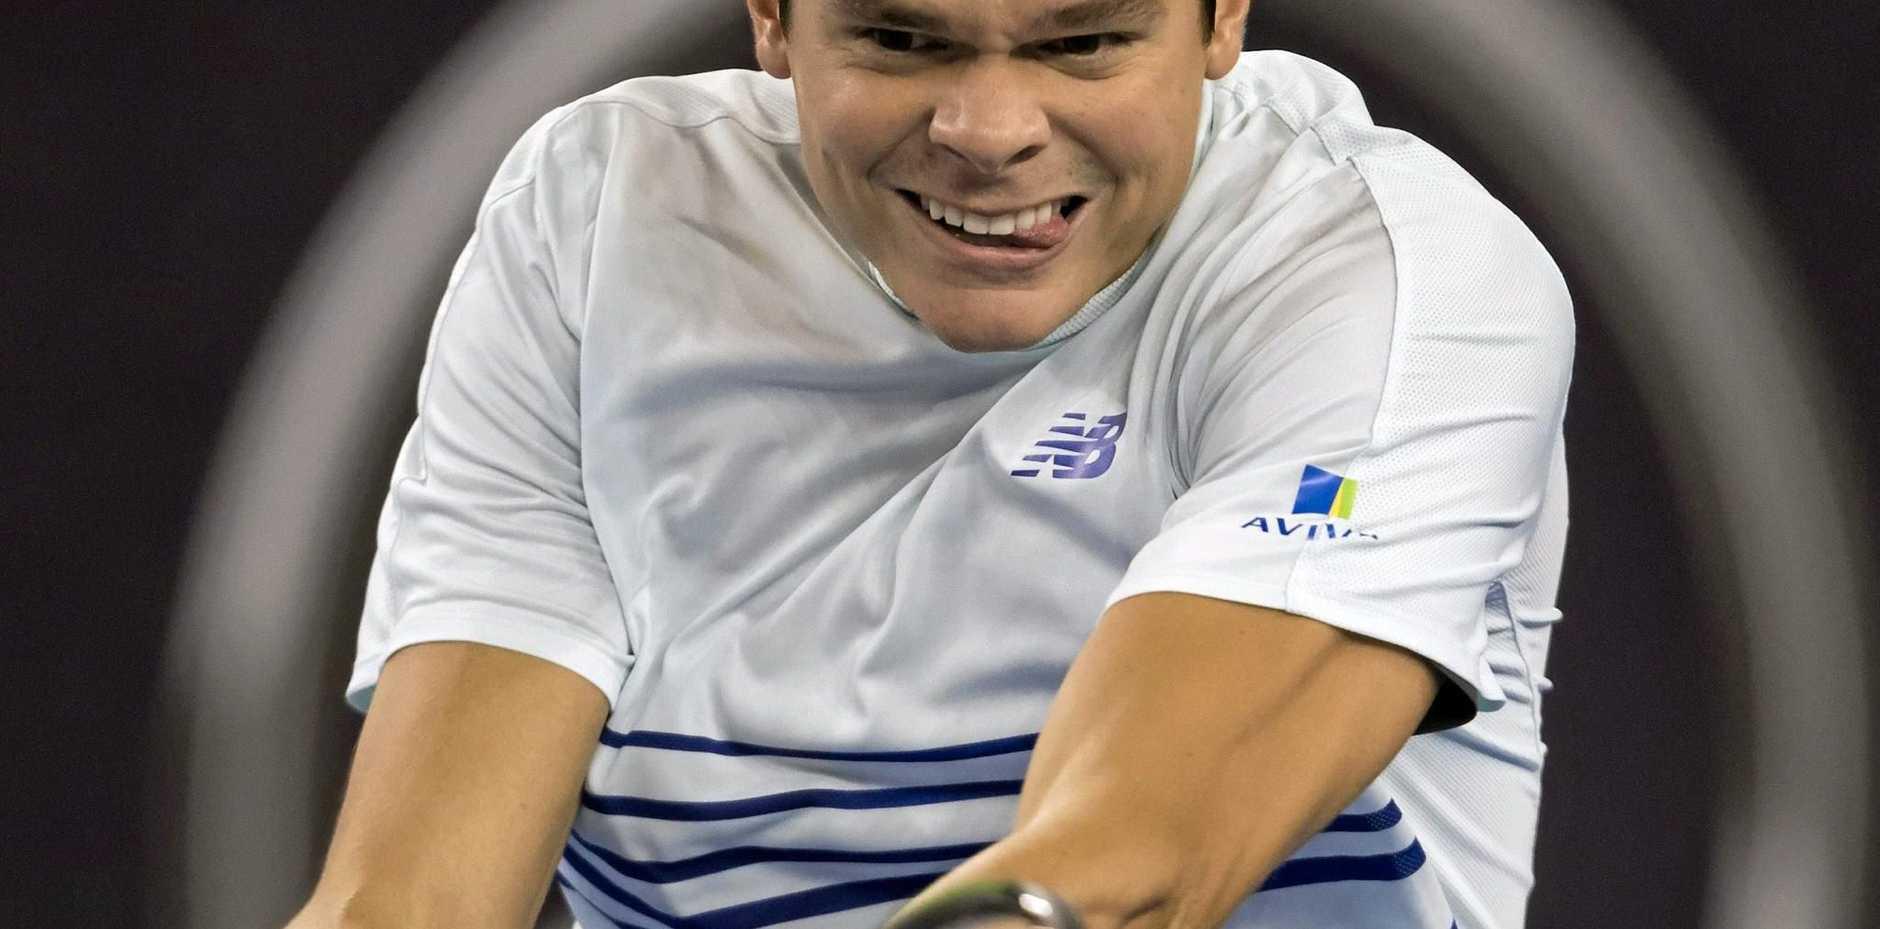 RETURNING: Canada's world No.6, Milos Raonic, will defend his Brisbane International title.